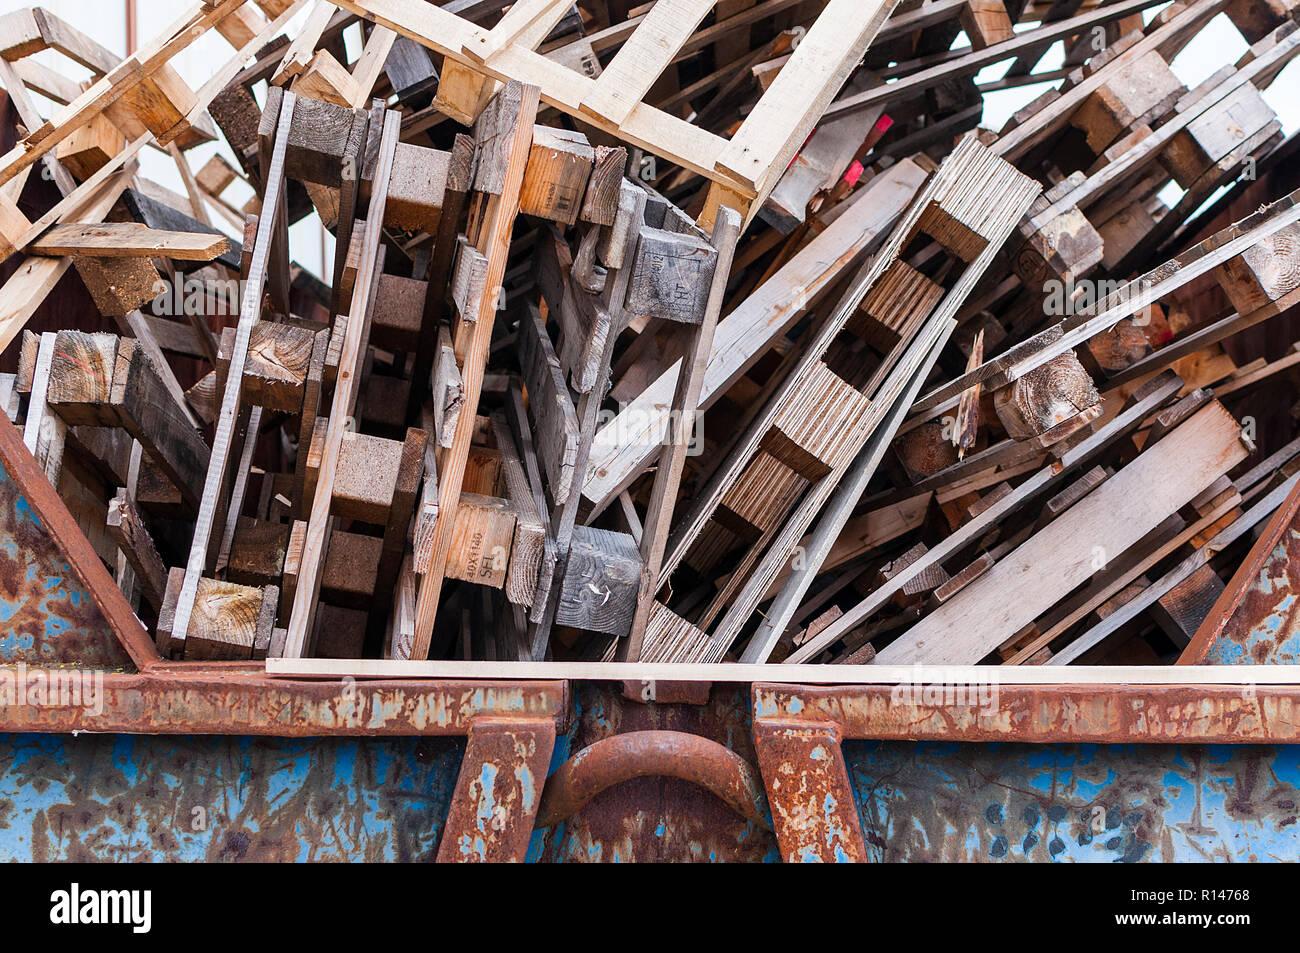 pallets thrown away - Stock Image